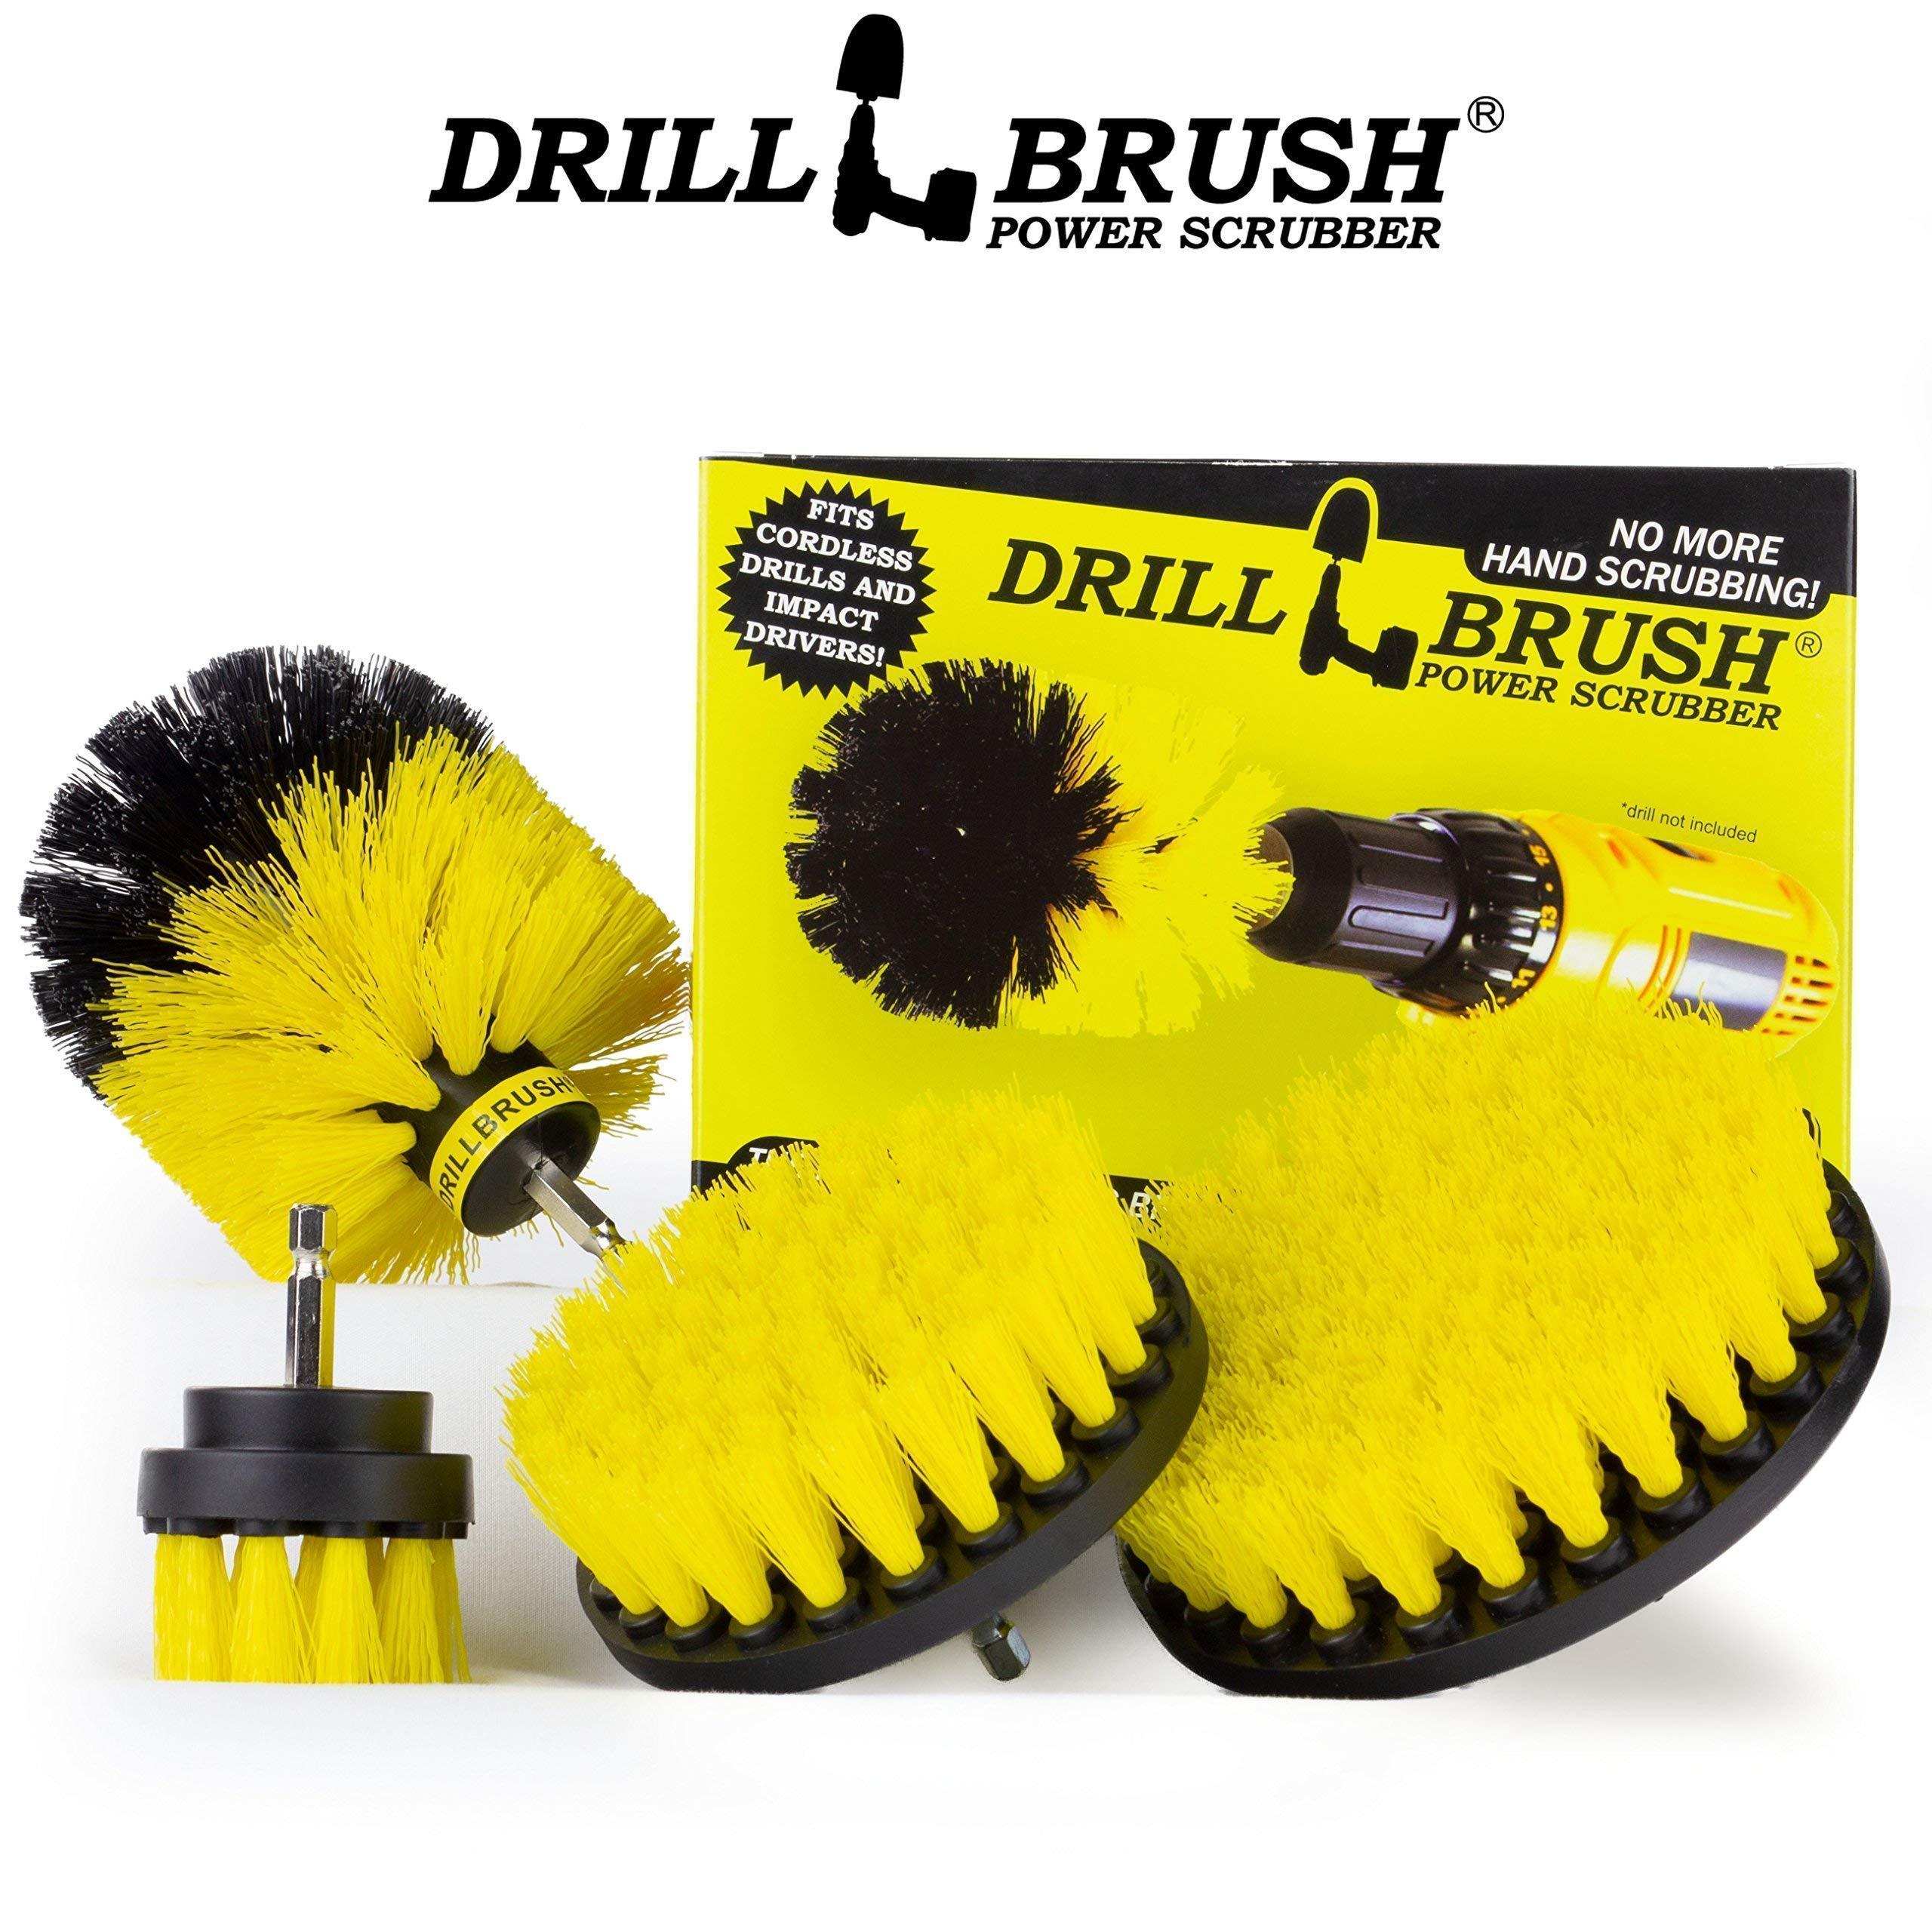 Drillbrush 4 Piece Nylon Power Brush Tile and Grout Bathroom Cleaning Scrub Brush Kit - Drill